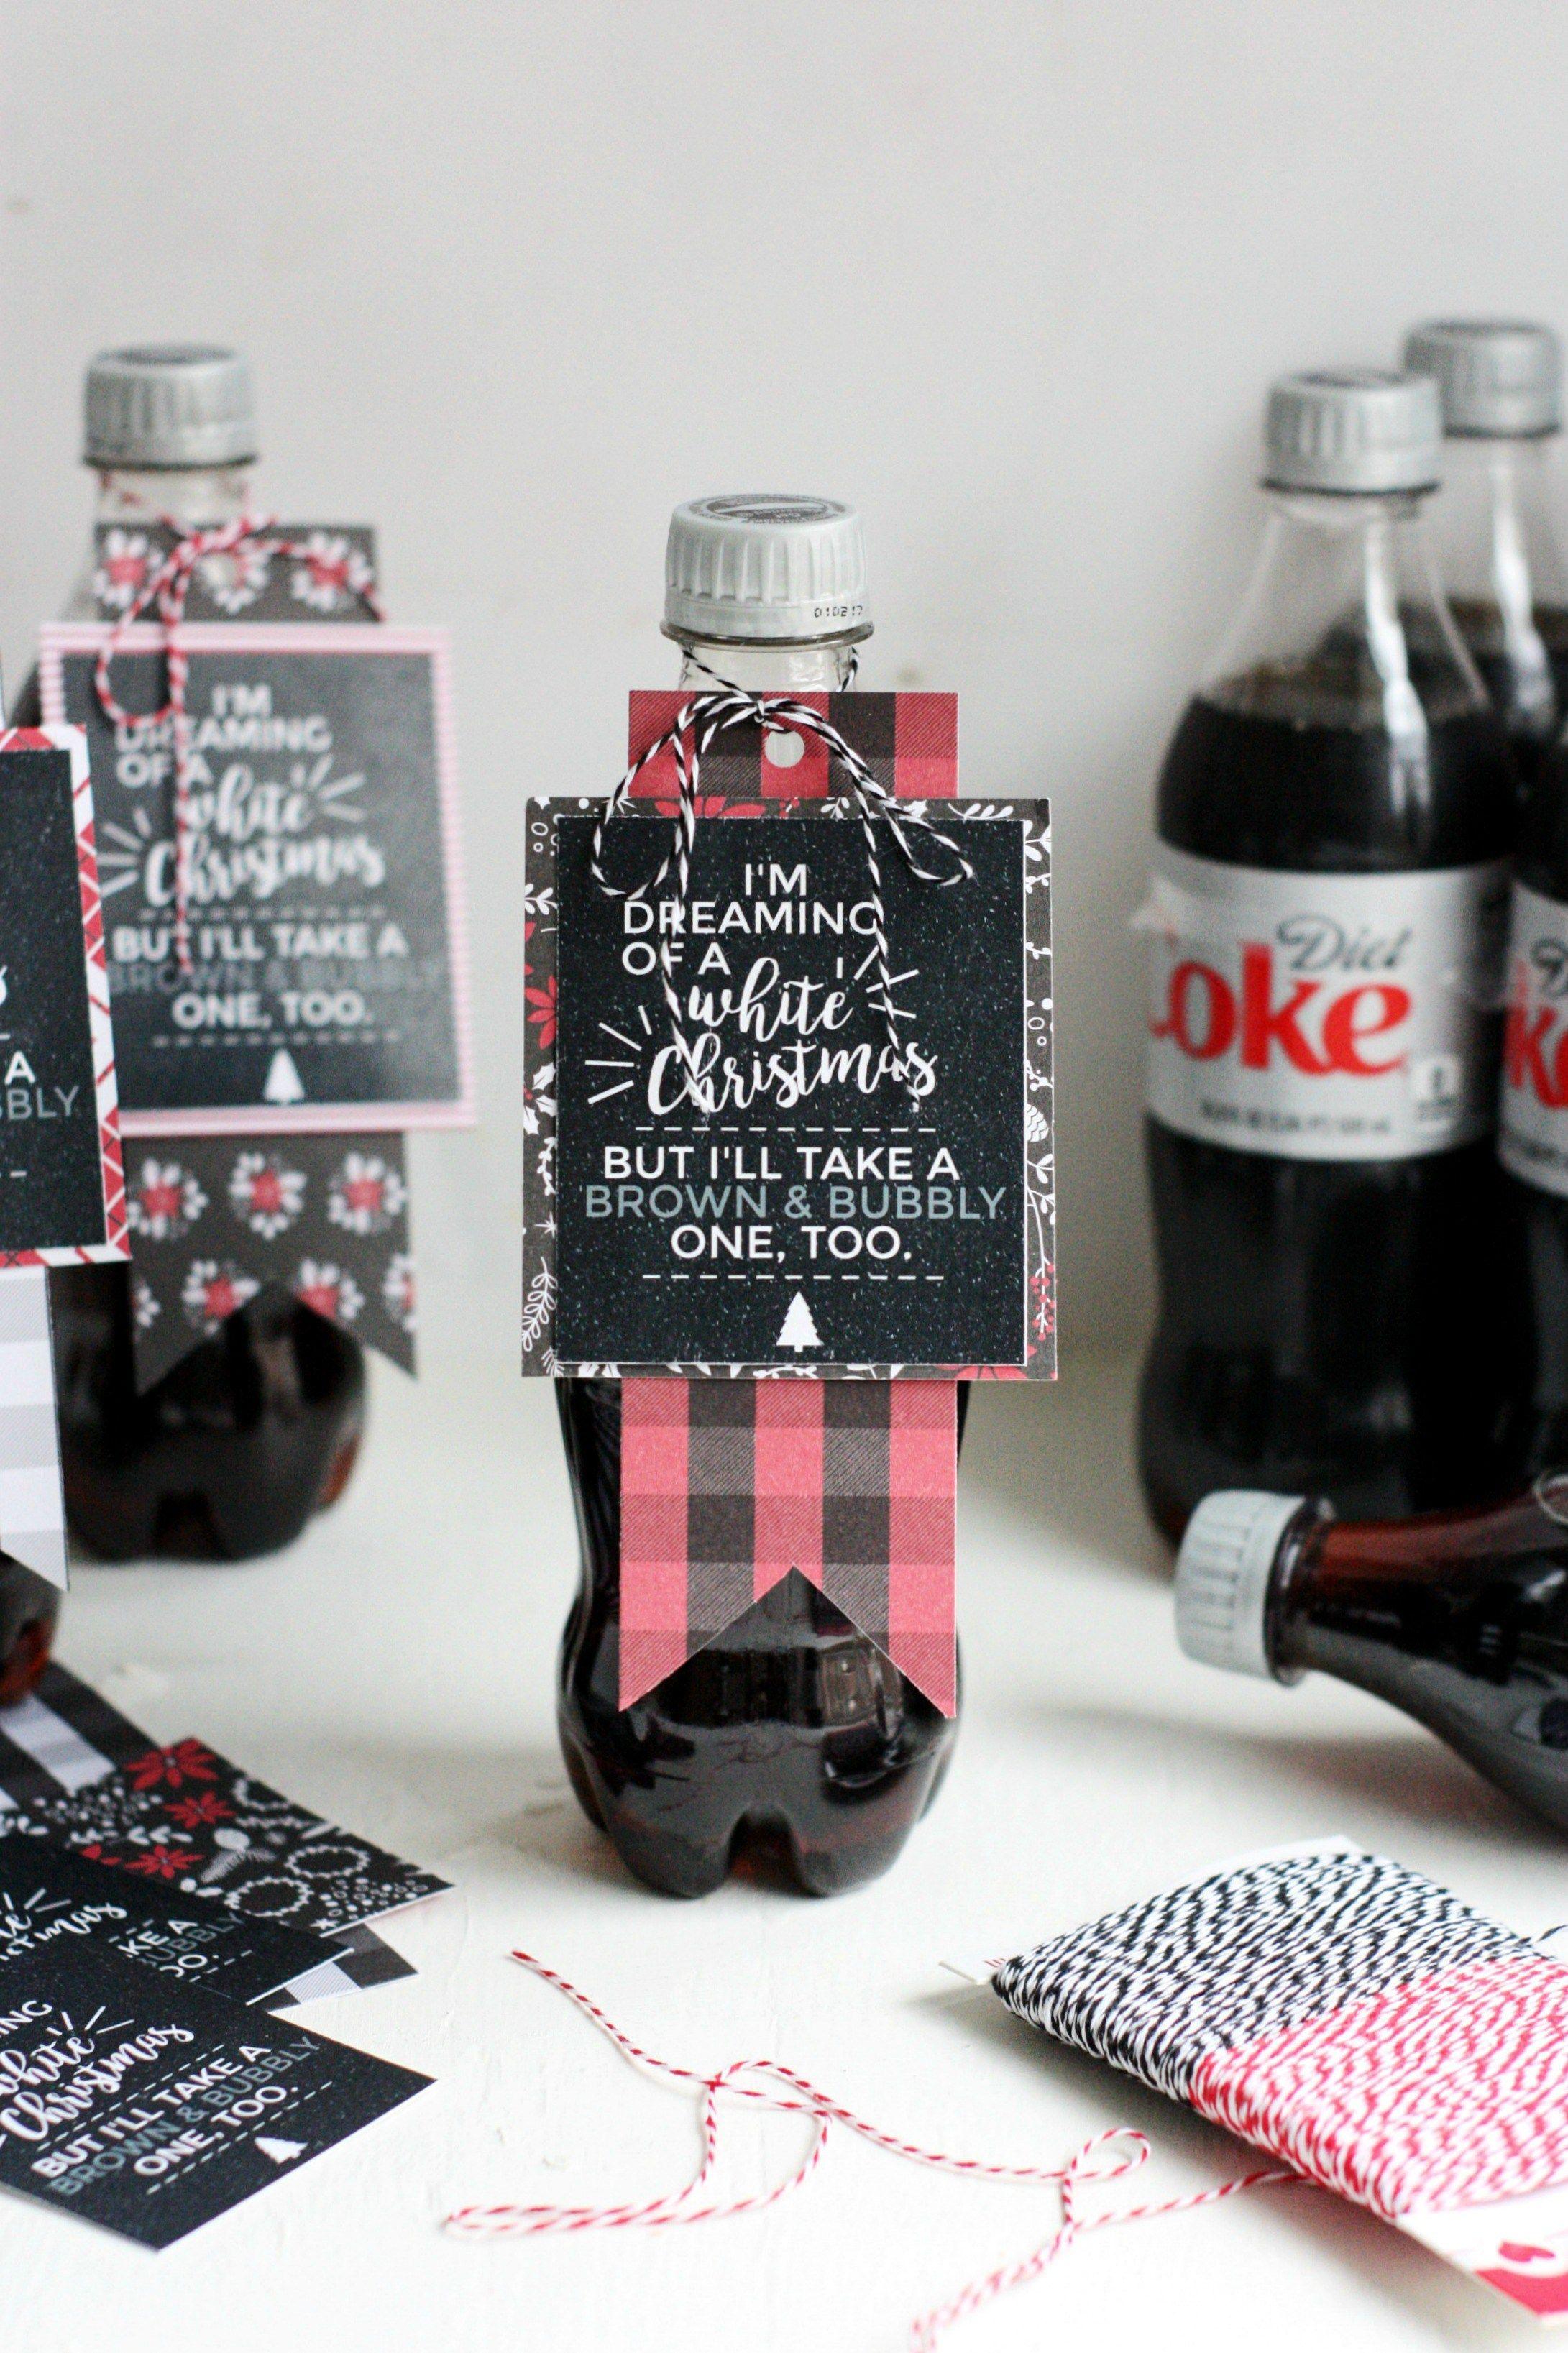 Diy diet coke gift tag printable the pretty life girls diy diet coke gift tag printable the pretty life girls layeronlove ad negle Gallery